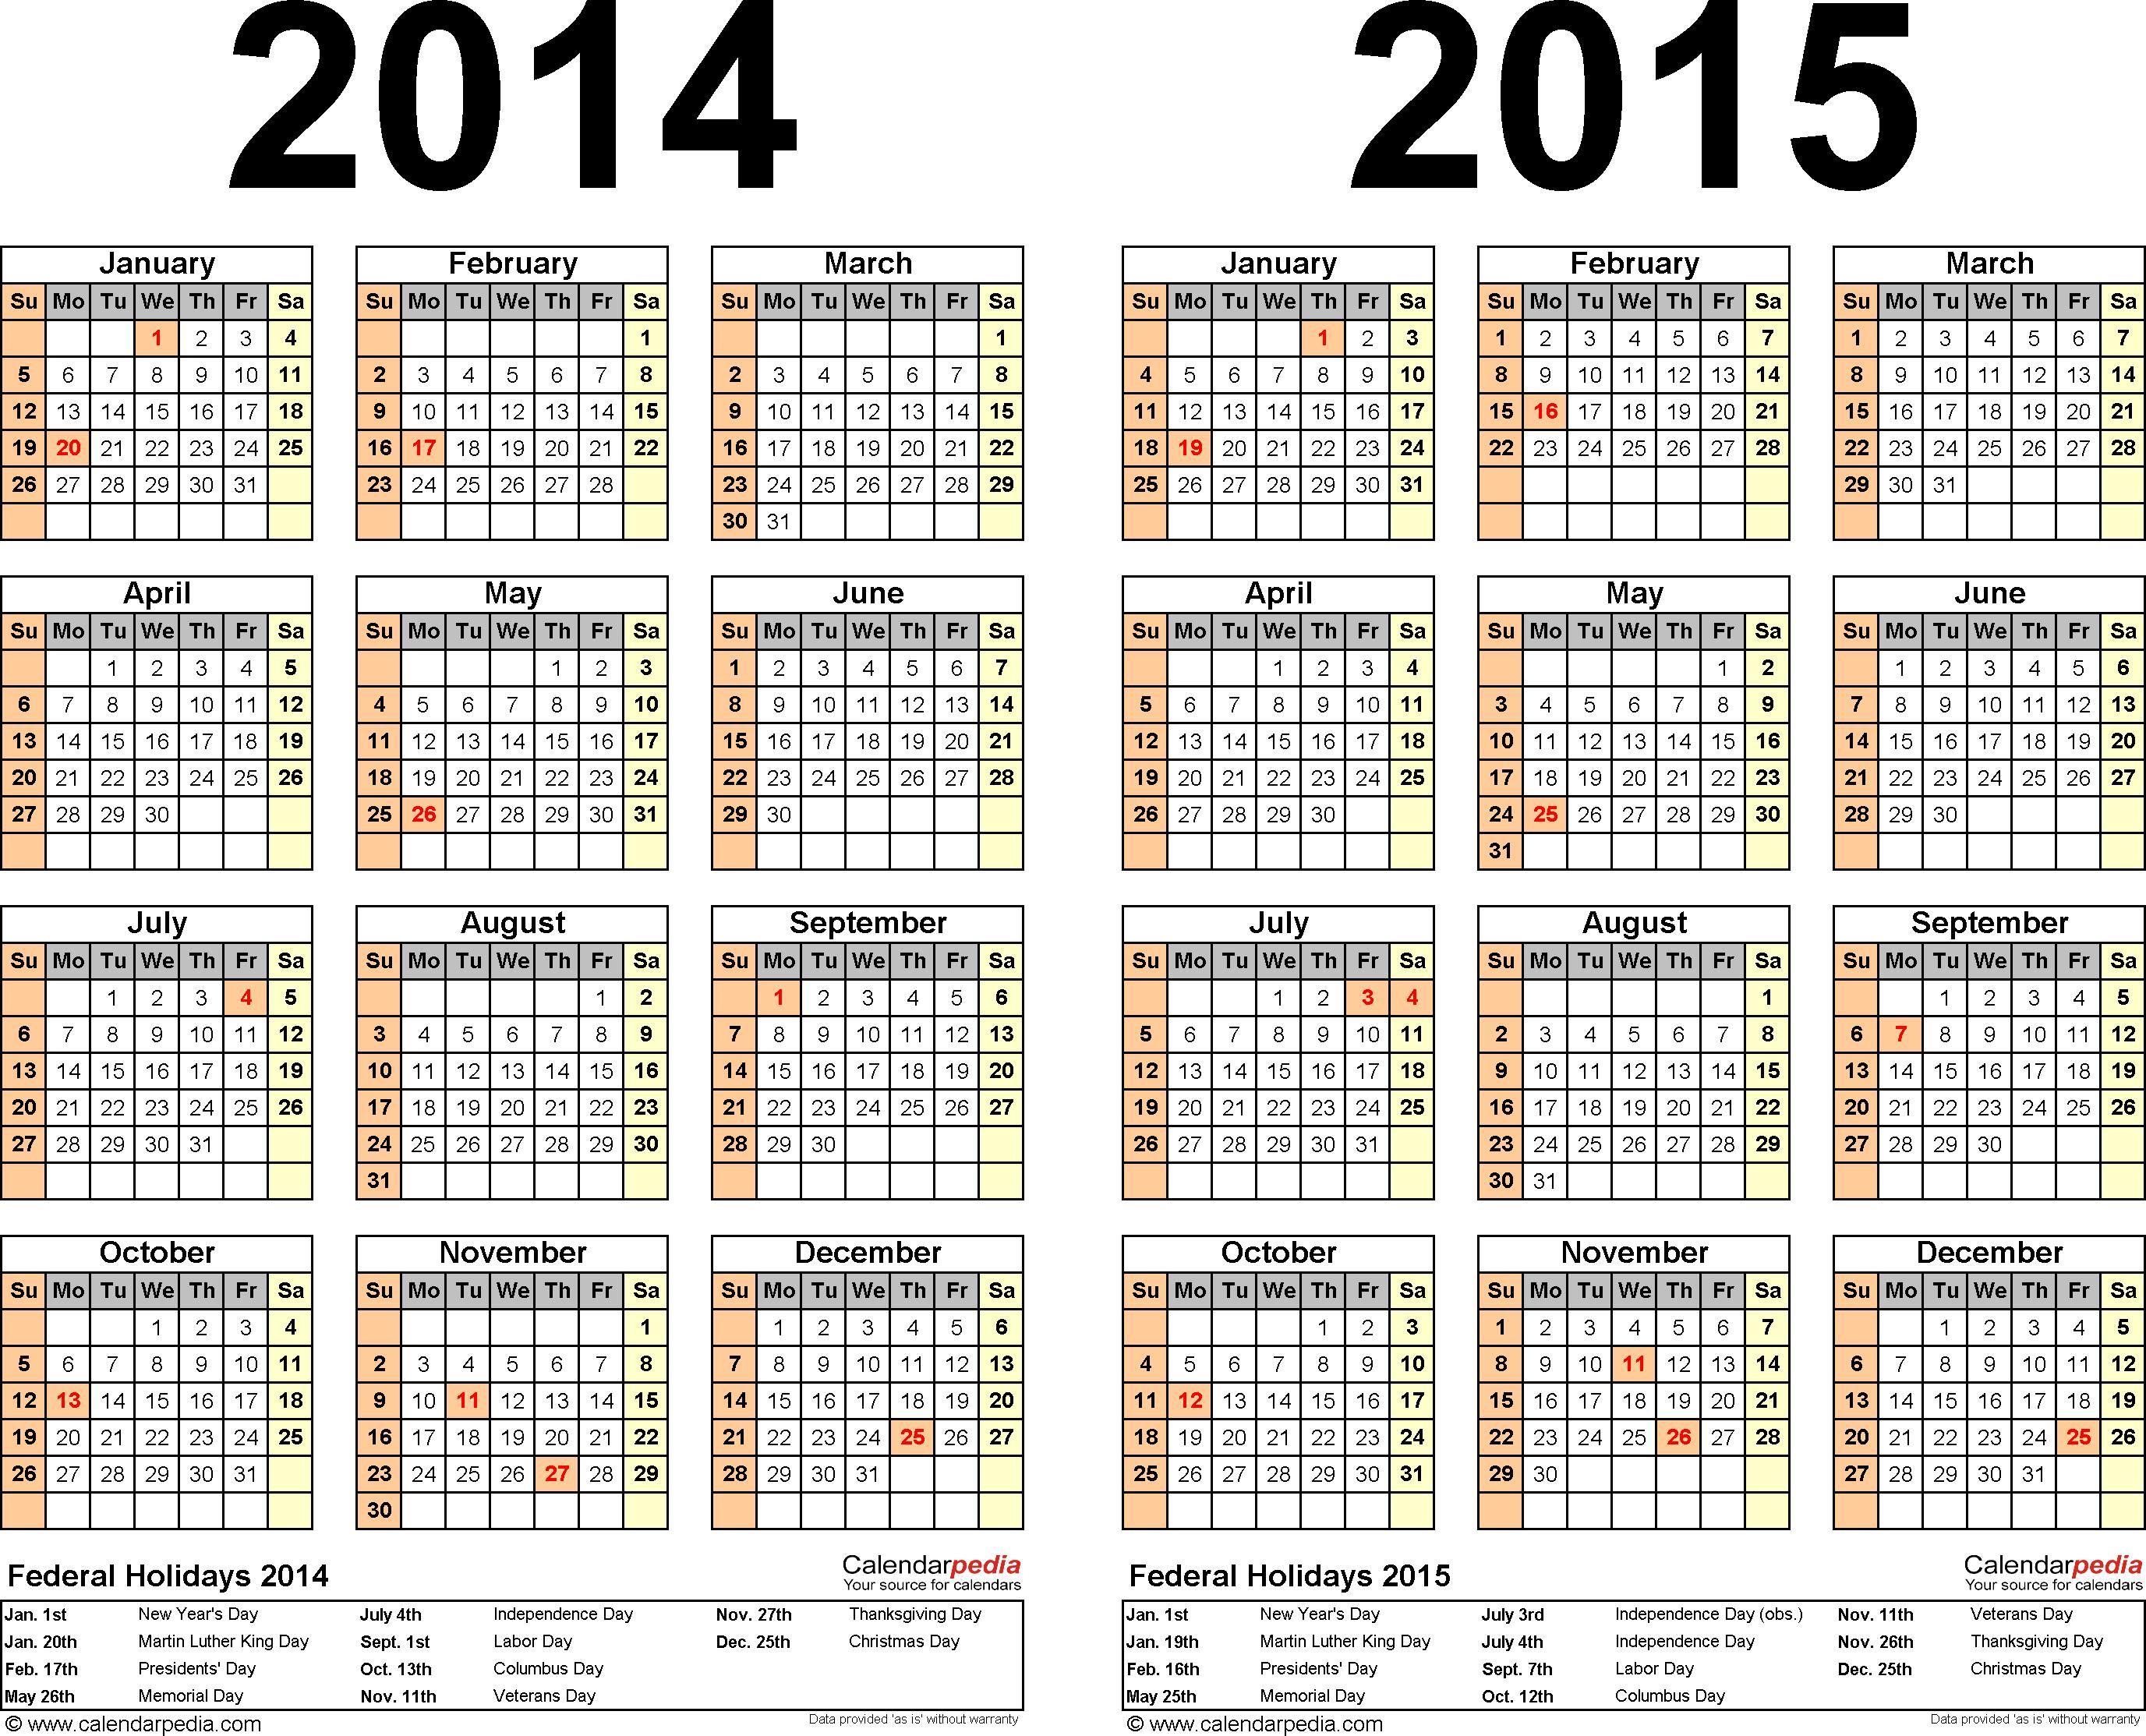 Free Download Calendars 2015 Desktop Wallpapers Wallpapers within Bangla Calendar 2015